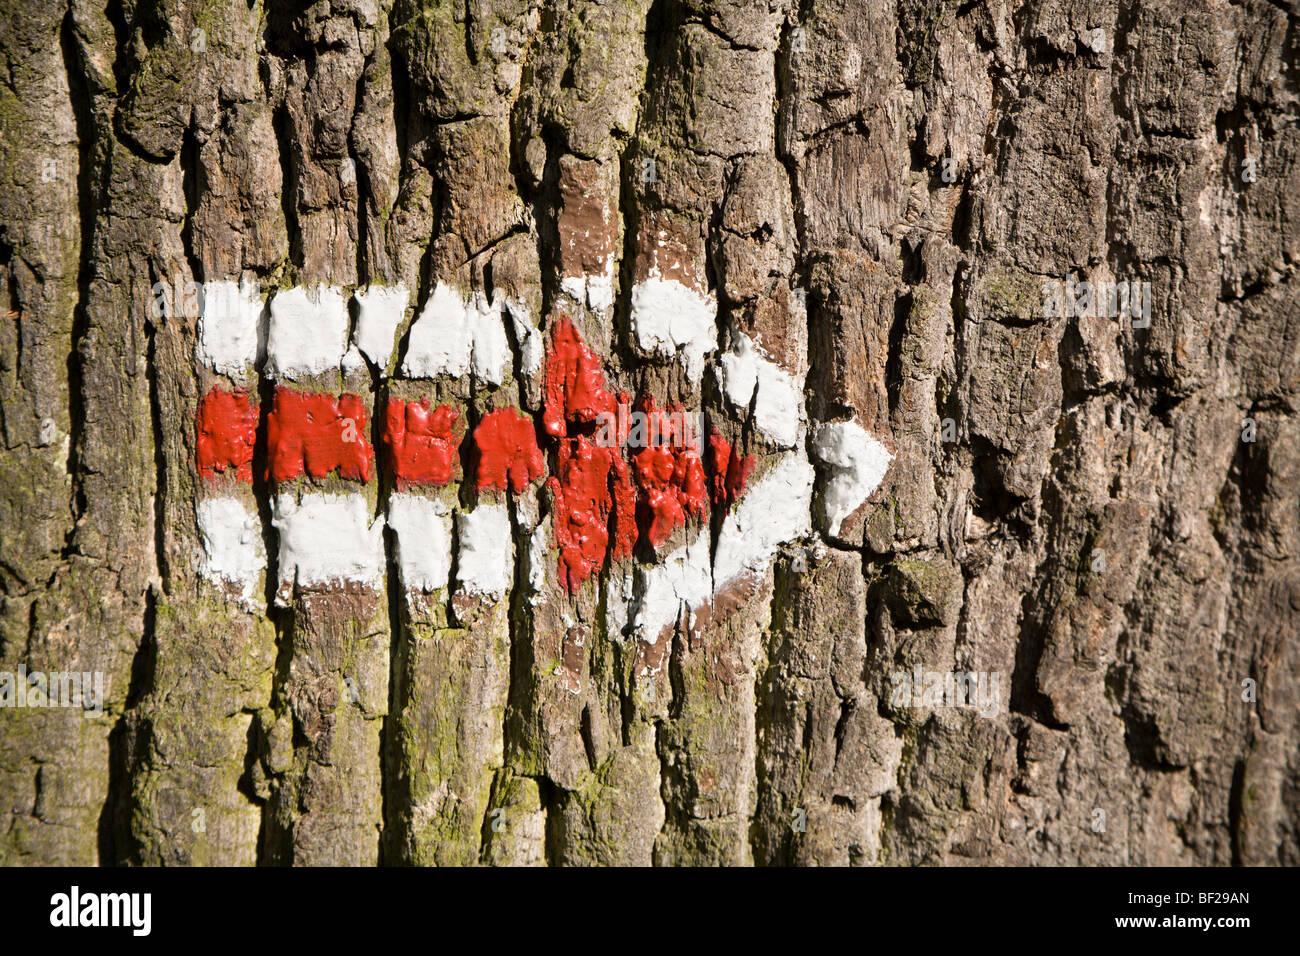 arrow on the tree - Stock Image